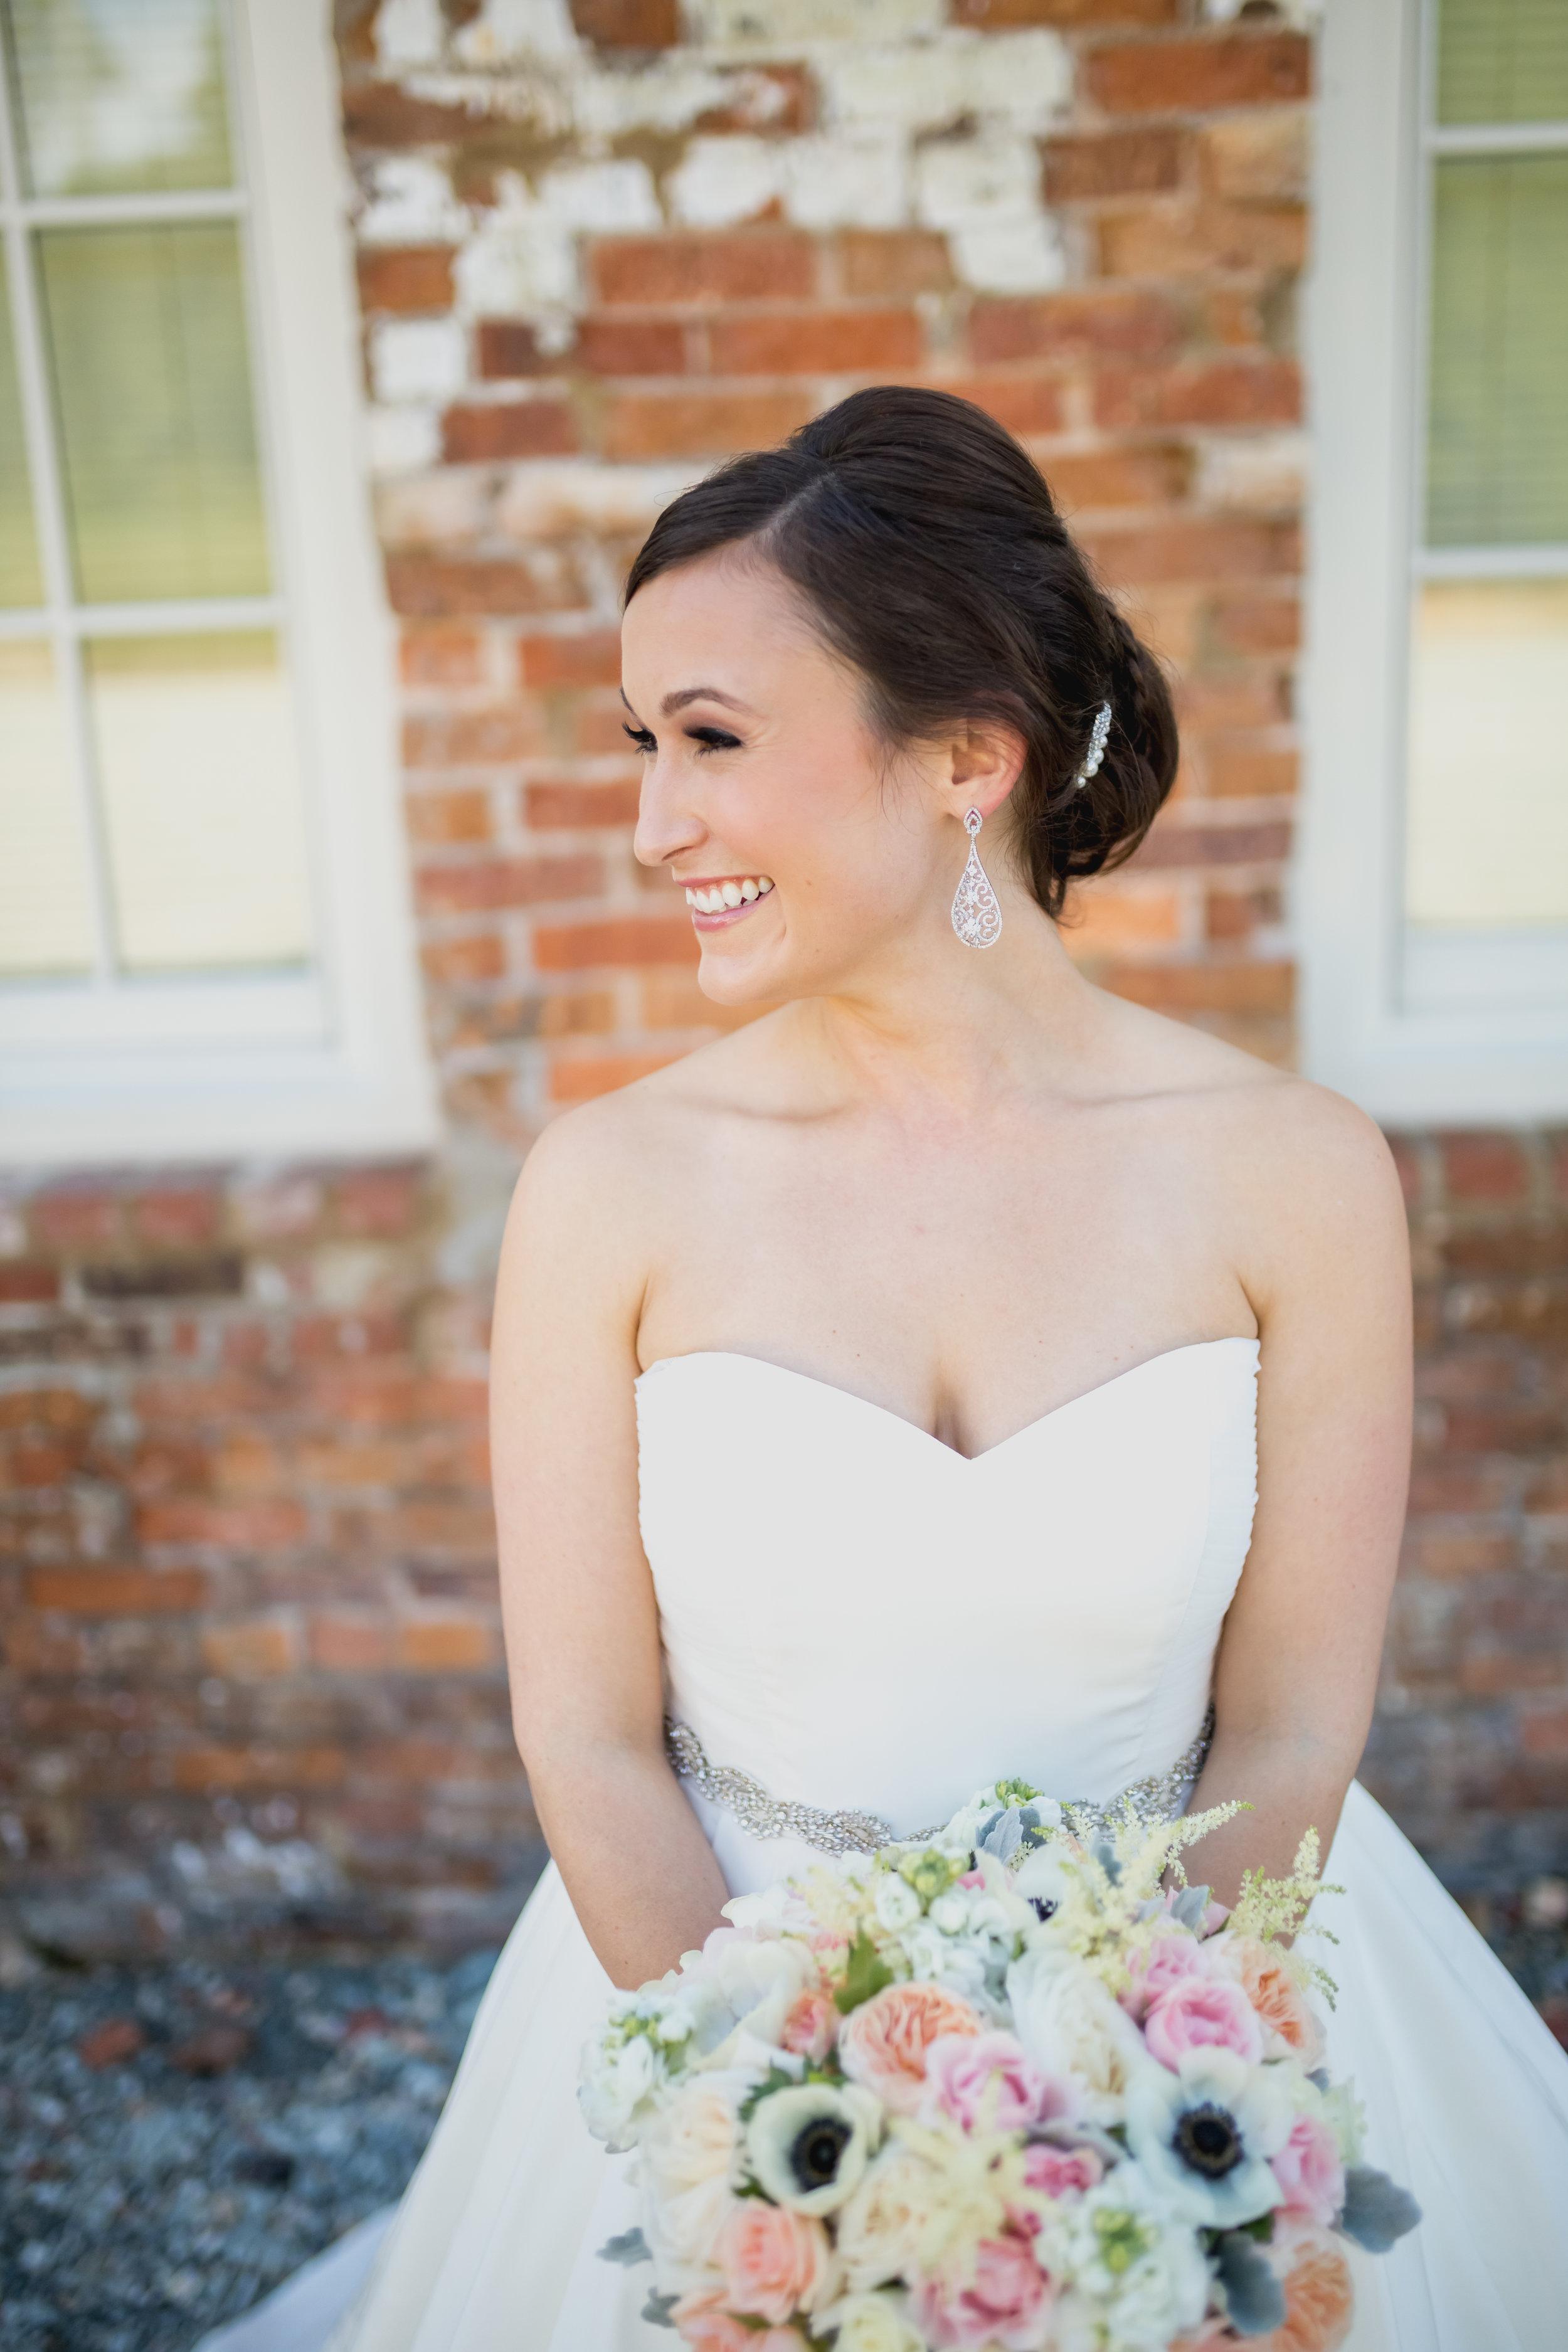 Tollini-Rowley Wedding-138.jpg